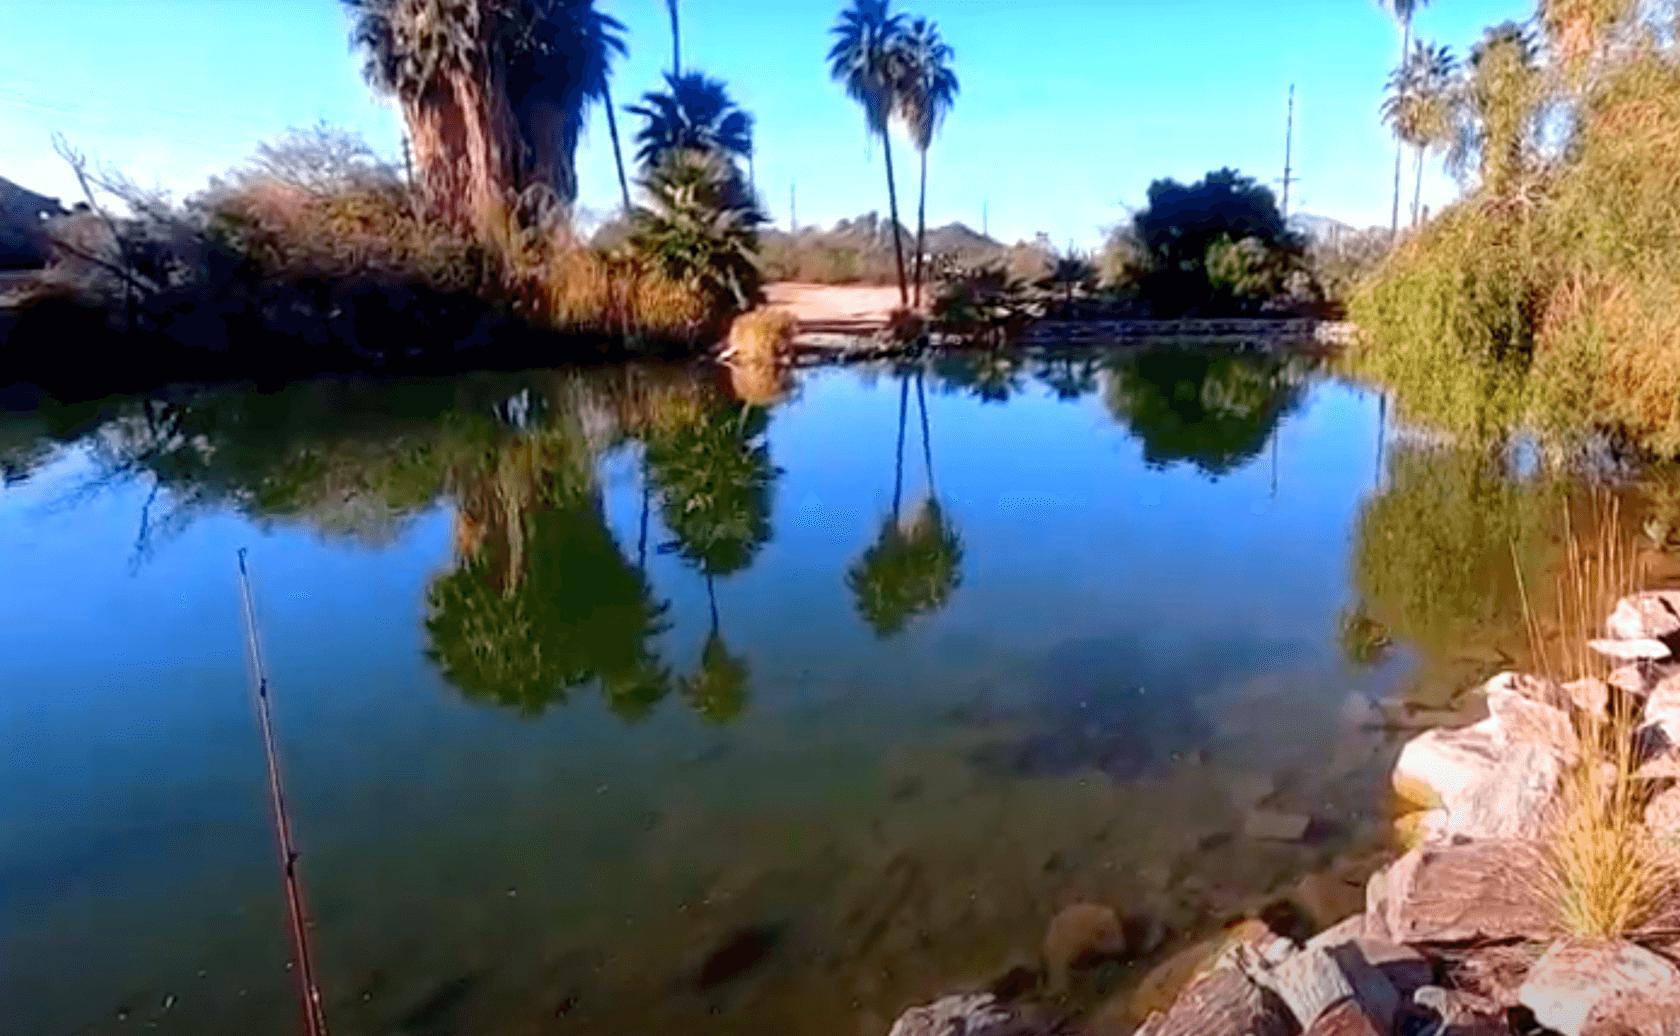 Evelyn-Hallman-Pond-Lake-Fishing-Guide-Tempe-AZ-03